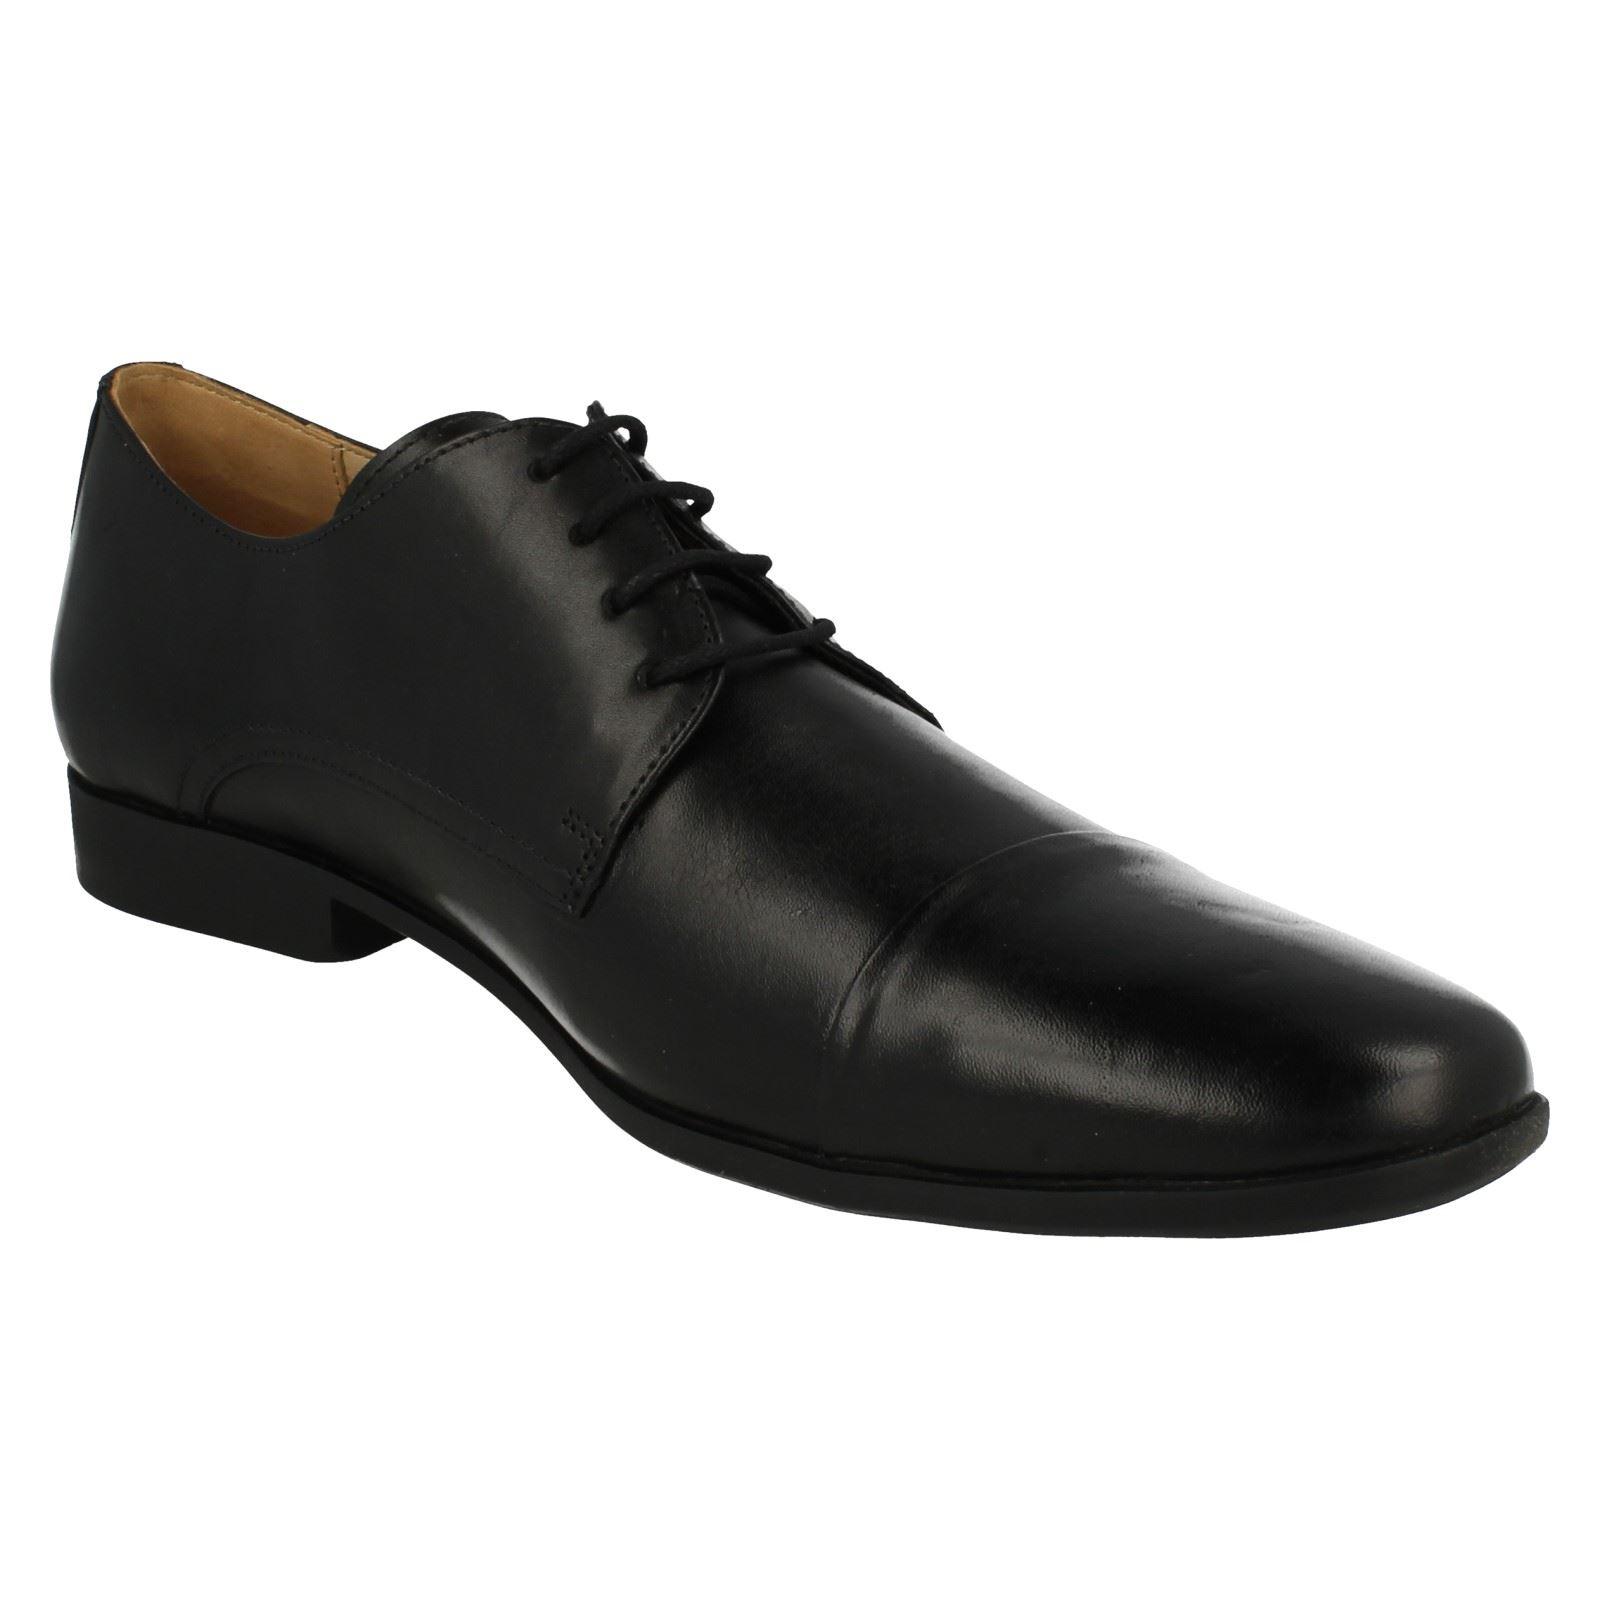 amp; Shoes Formal Co Anatomic Amparo Up Mens Black Lace Leather SCFTnqwx